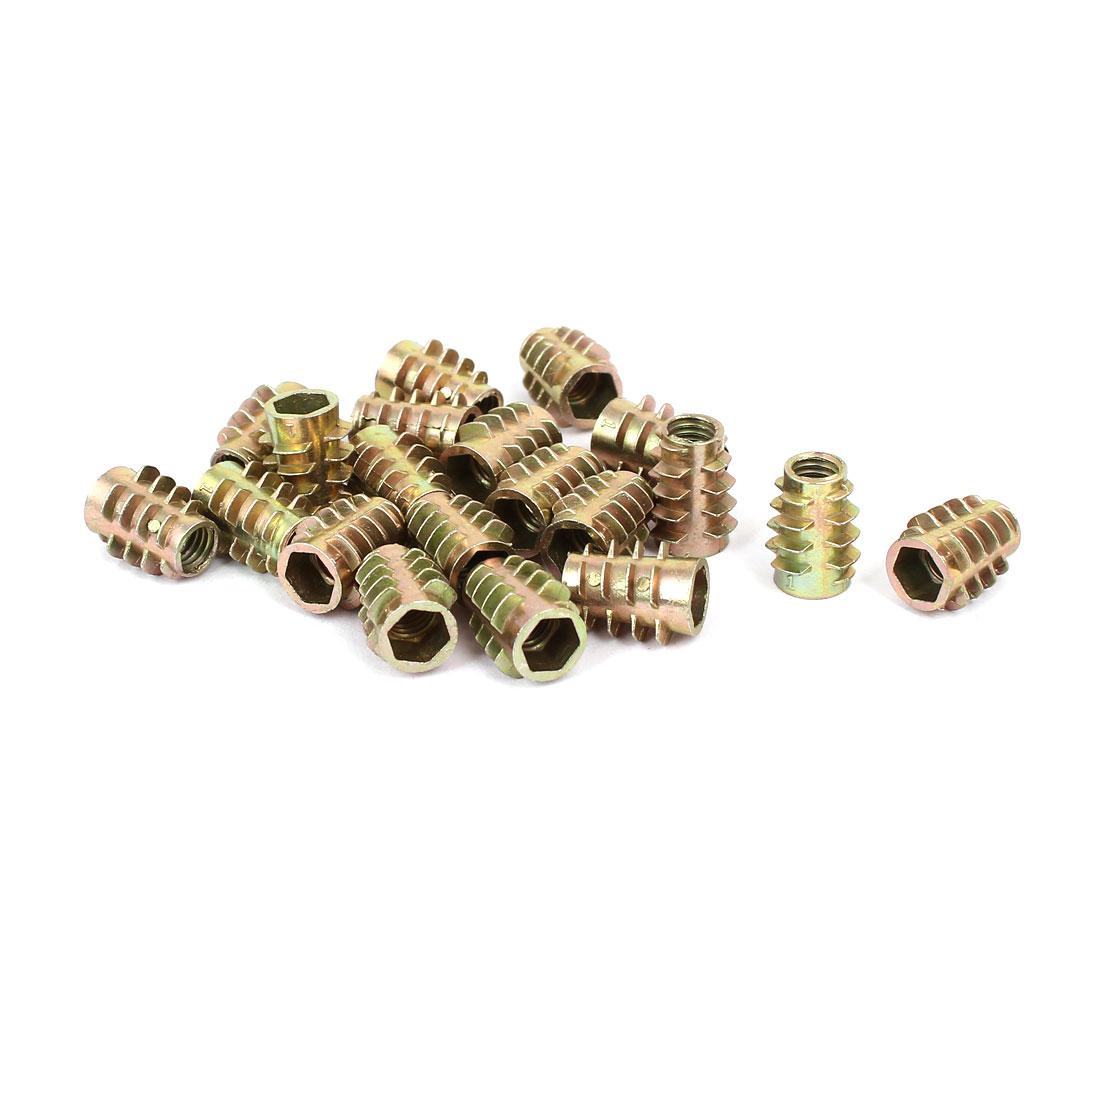 Wood Furniture Zinc Alloy Hex Socket Insert Screws E-Nuts M6x15mm 20pcs